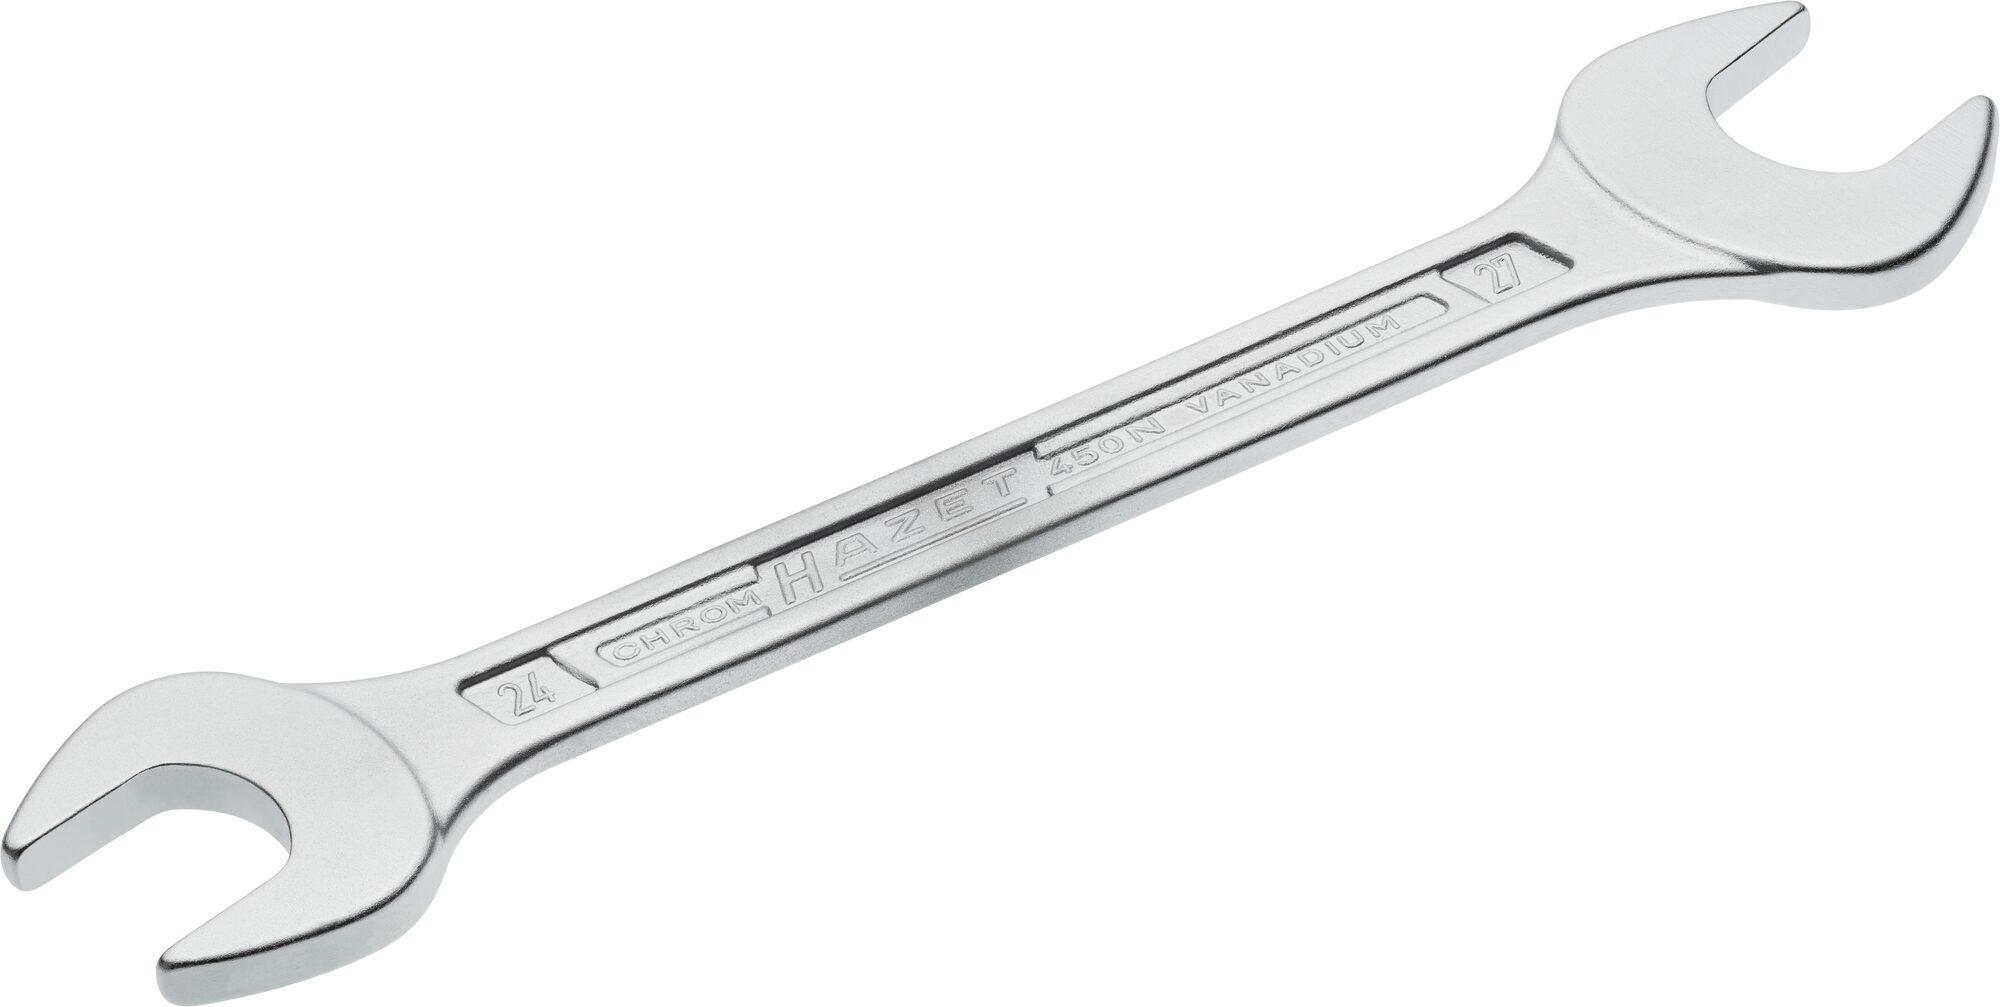 HAZET Doppel-Maulschlüssel 450N-24X27 ∙ Außen-Sechskant Profil ∙ 24 x 27 mm